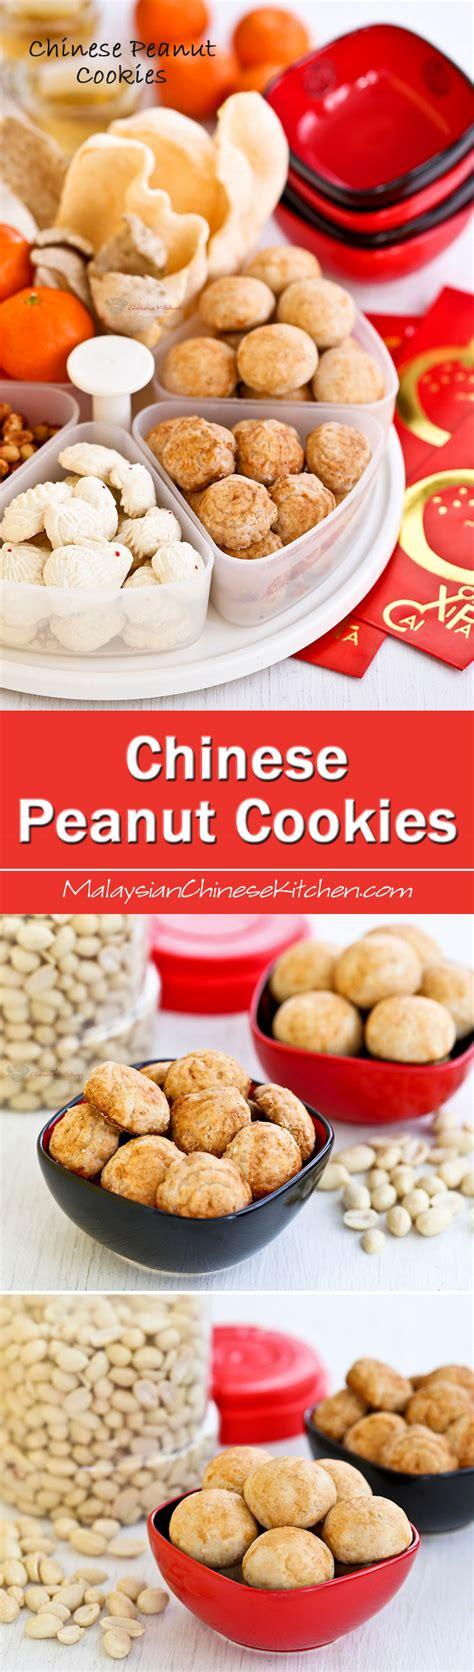 new year cookies 2015 malaysia peanut cookies malaysian kitchen